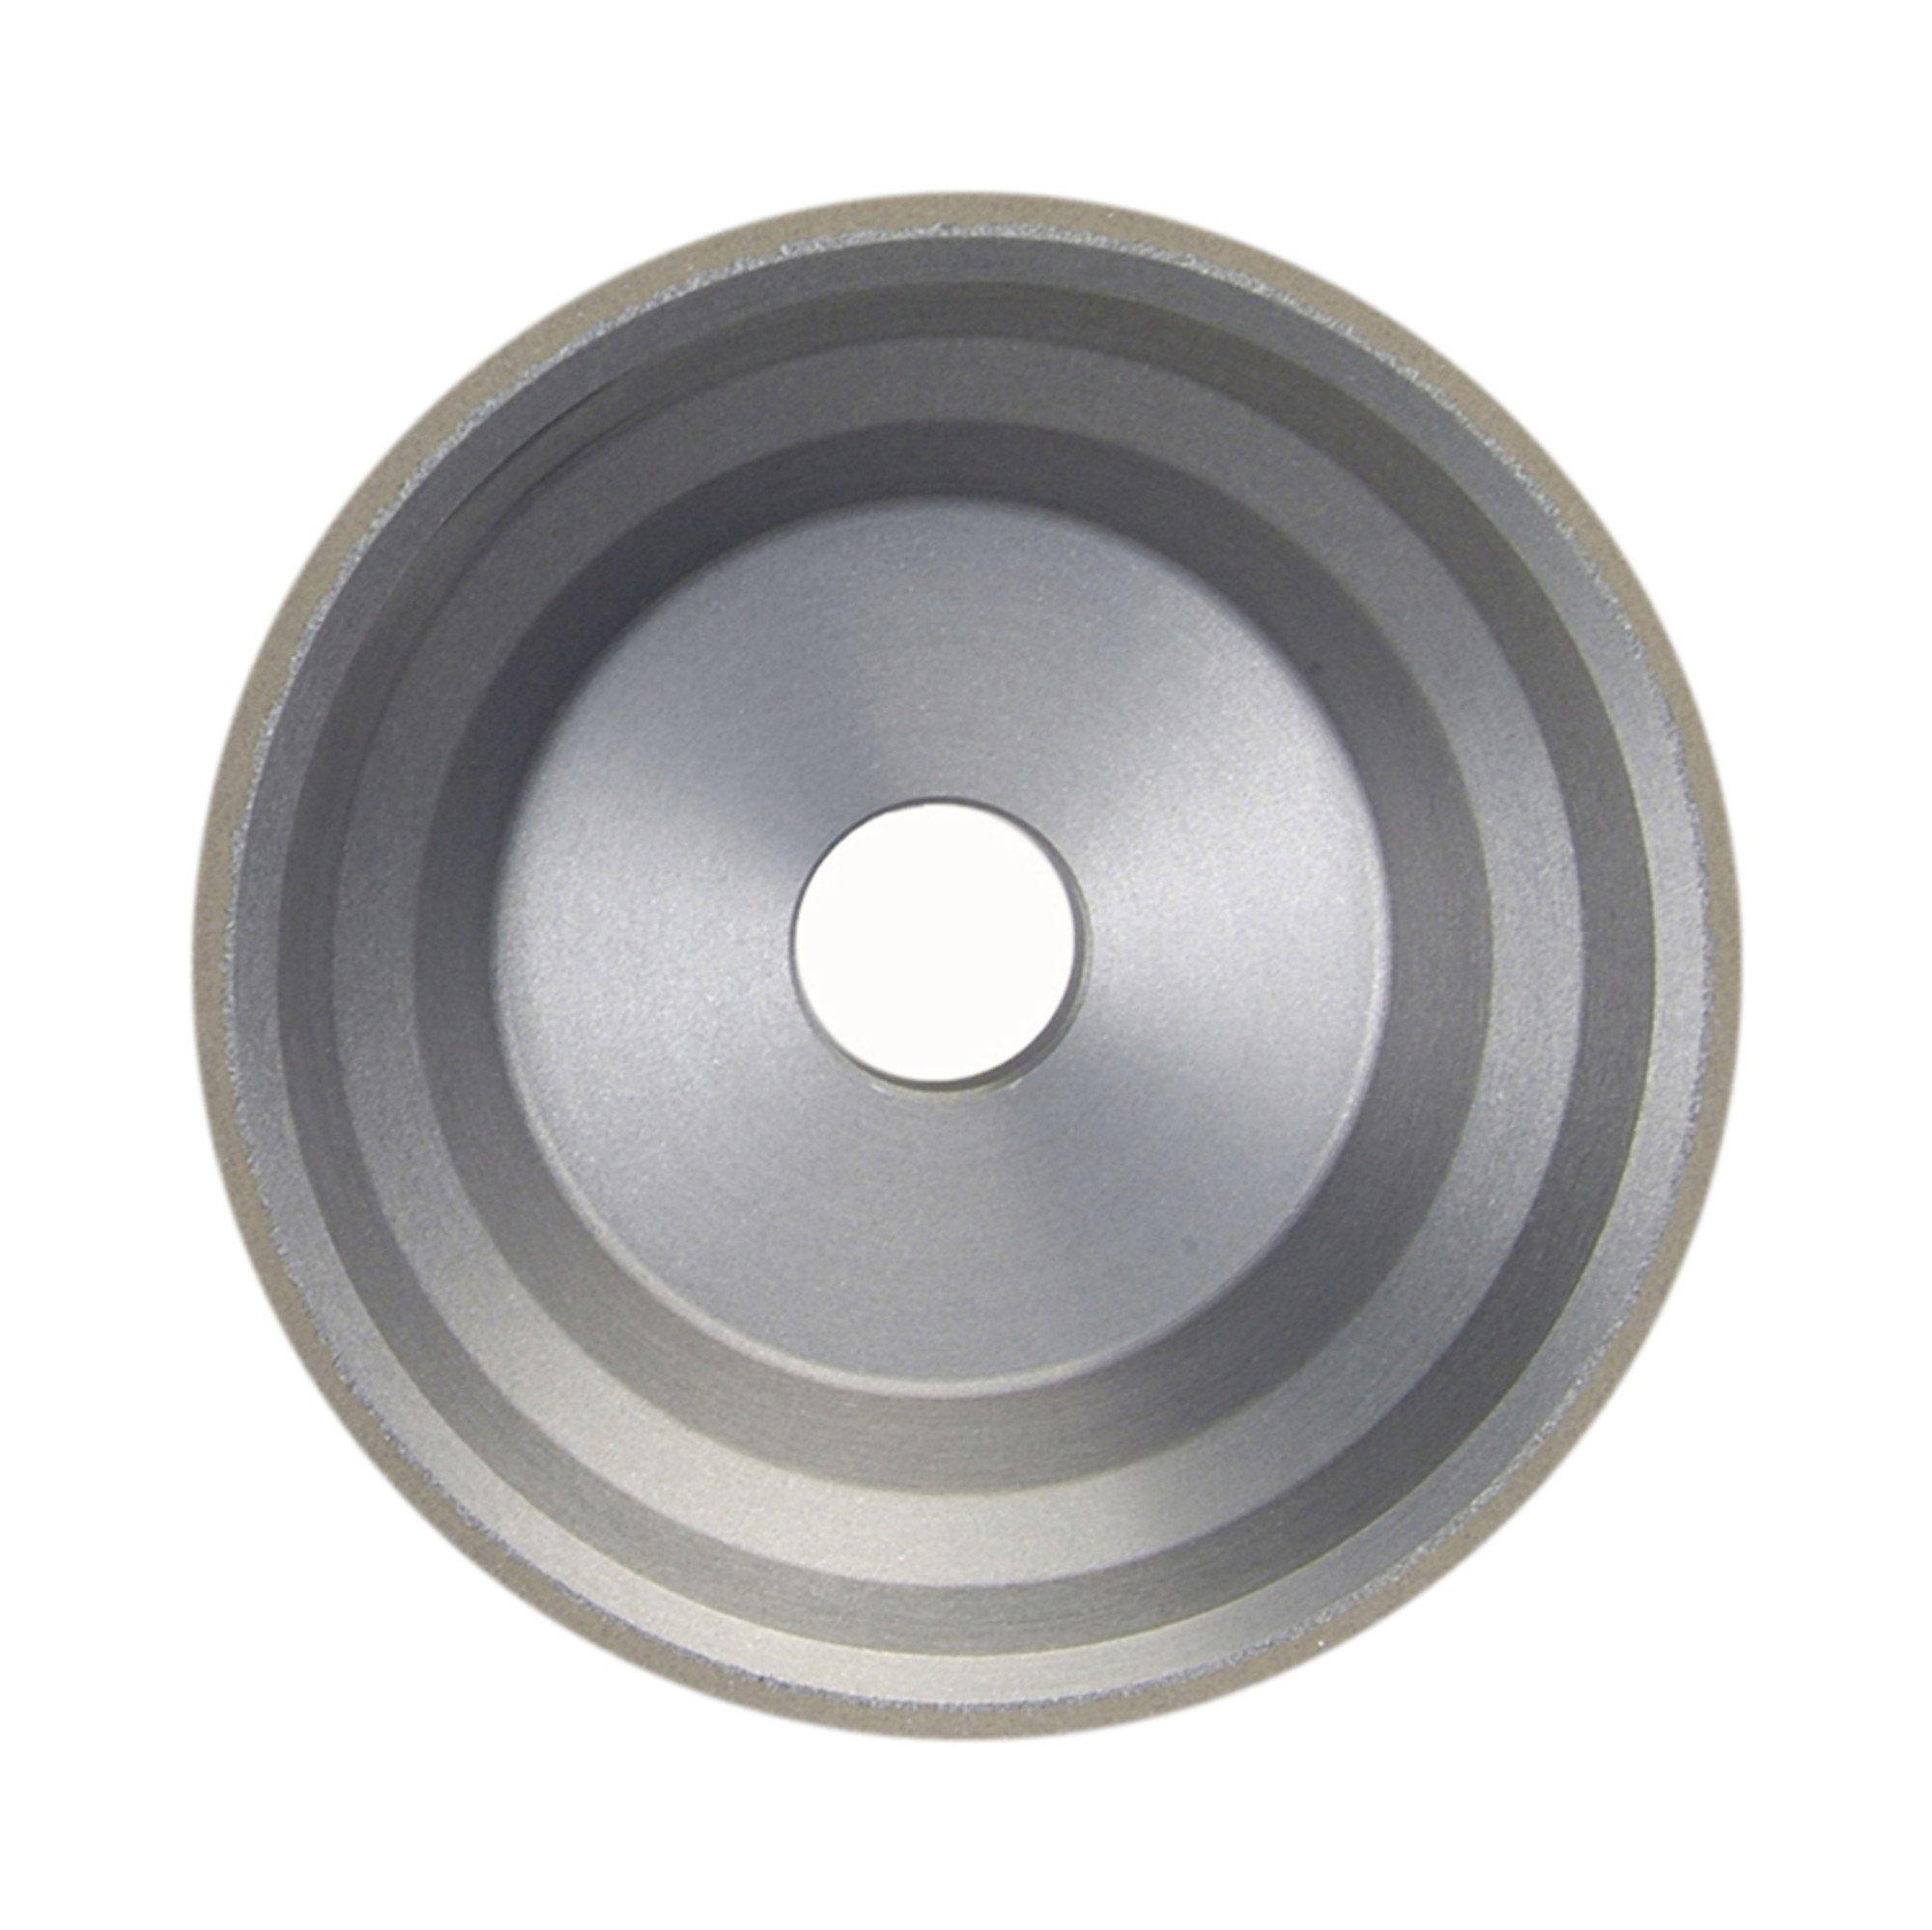 Norton Diamond Wheel 3-3/4'' Diameter 1-1/2'' Width 150 Grit General Application 11V9 Diamond Wheel